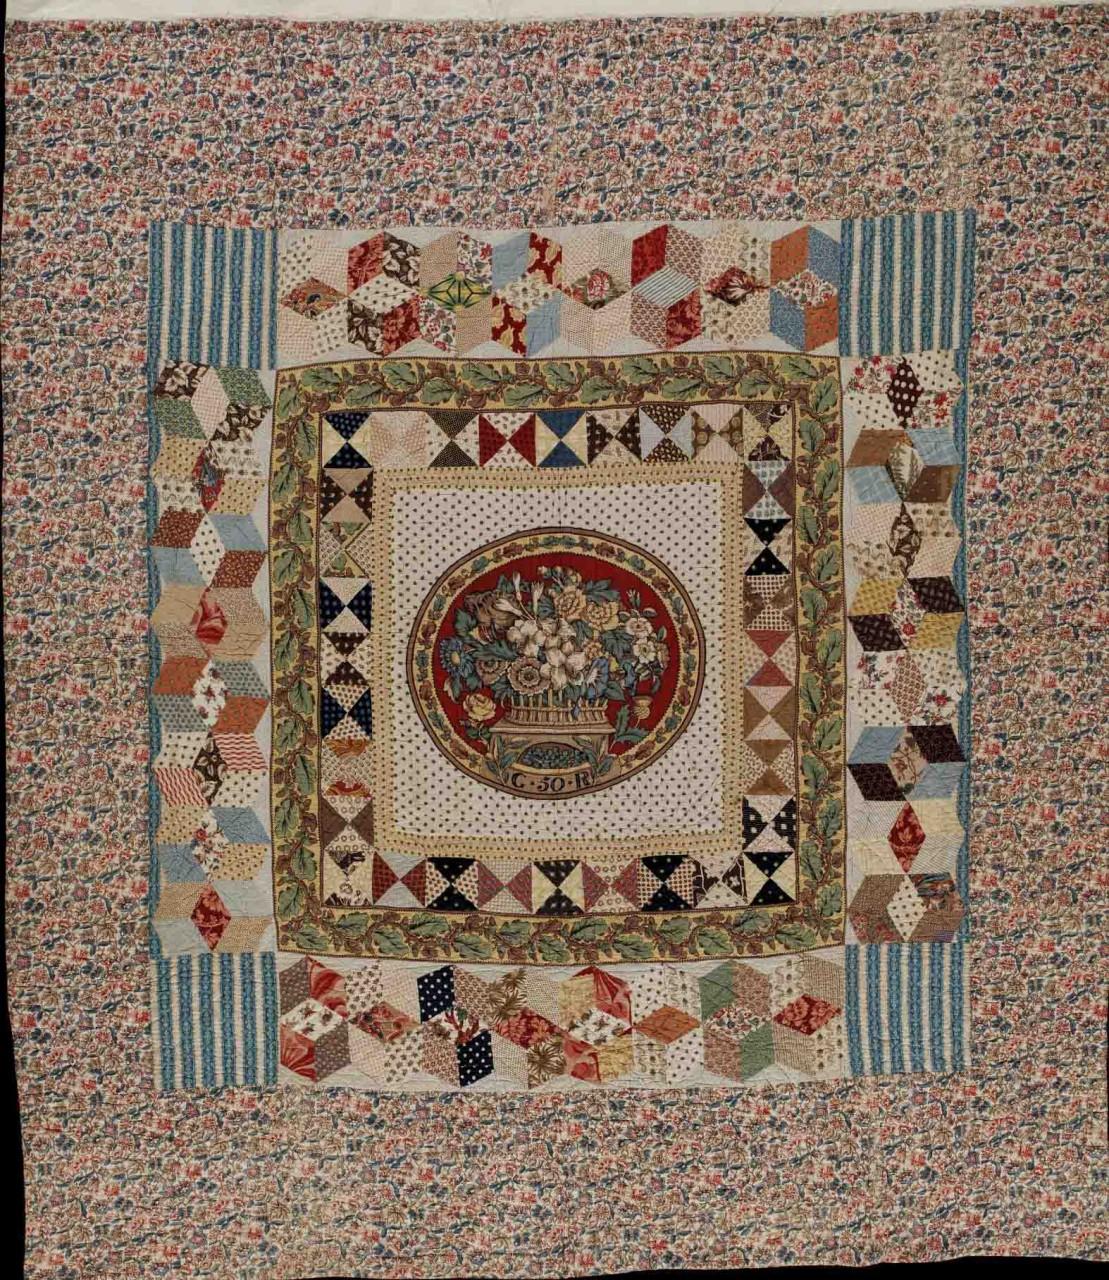 An Moonen Quilts.Antique Quilts And Textiles